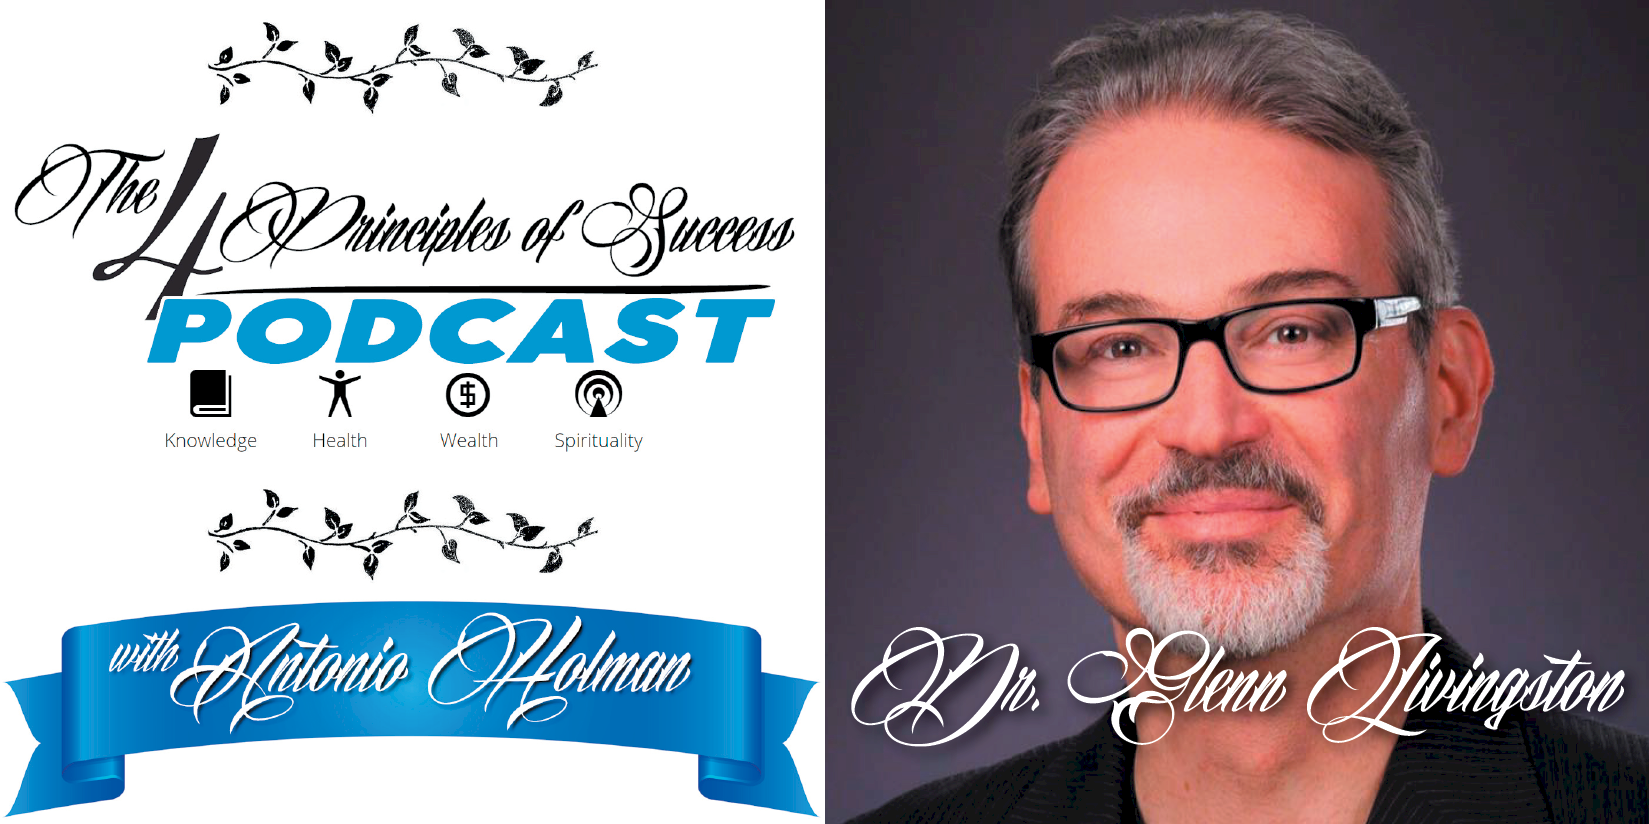 The 4 Principles of Success guest Dr. Glenn Livingston